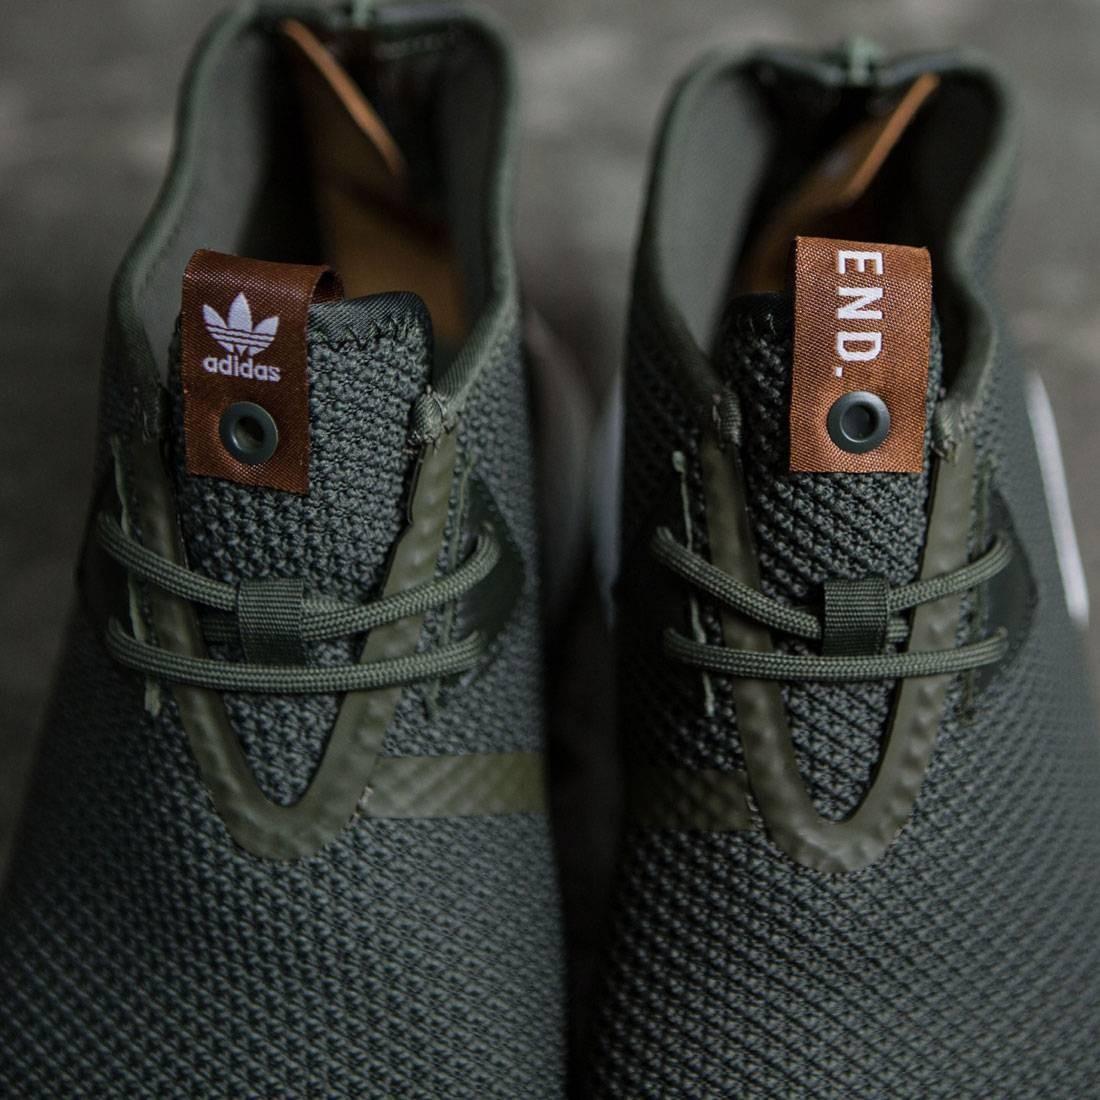 quality design 8cf12 a5cbe Adidas X Porter Japan NMD C1 Chukka US7